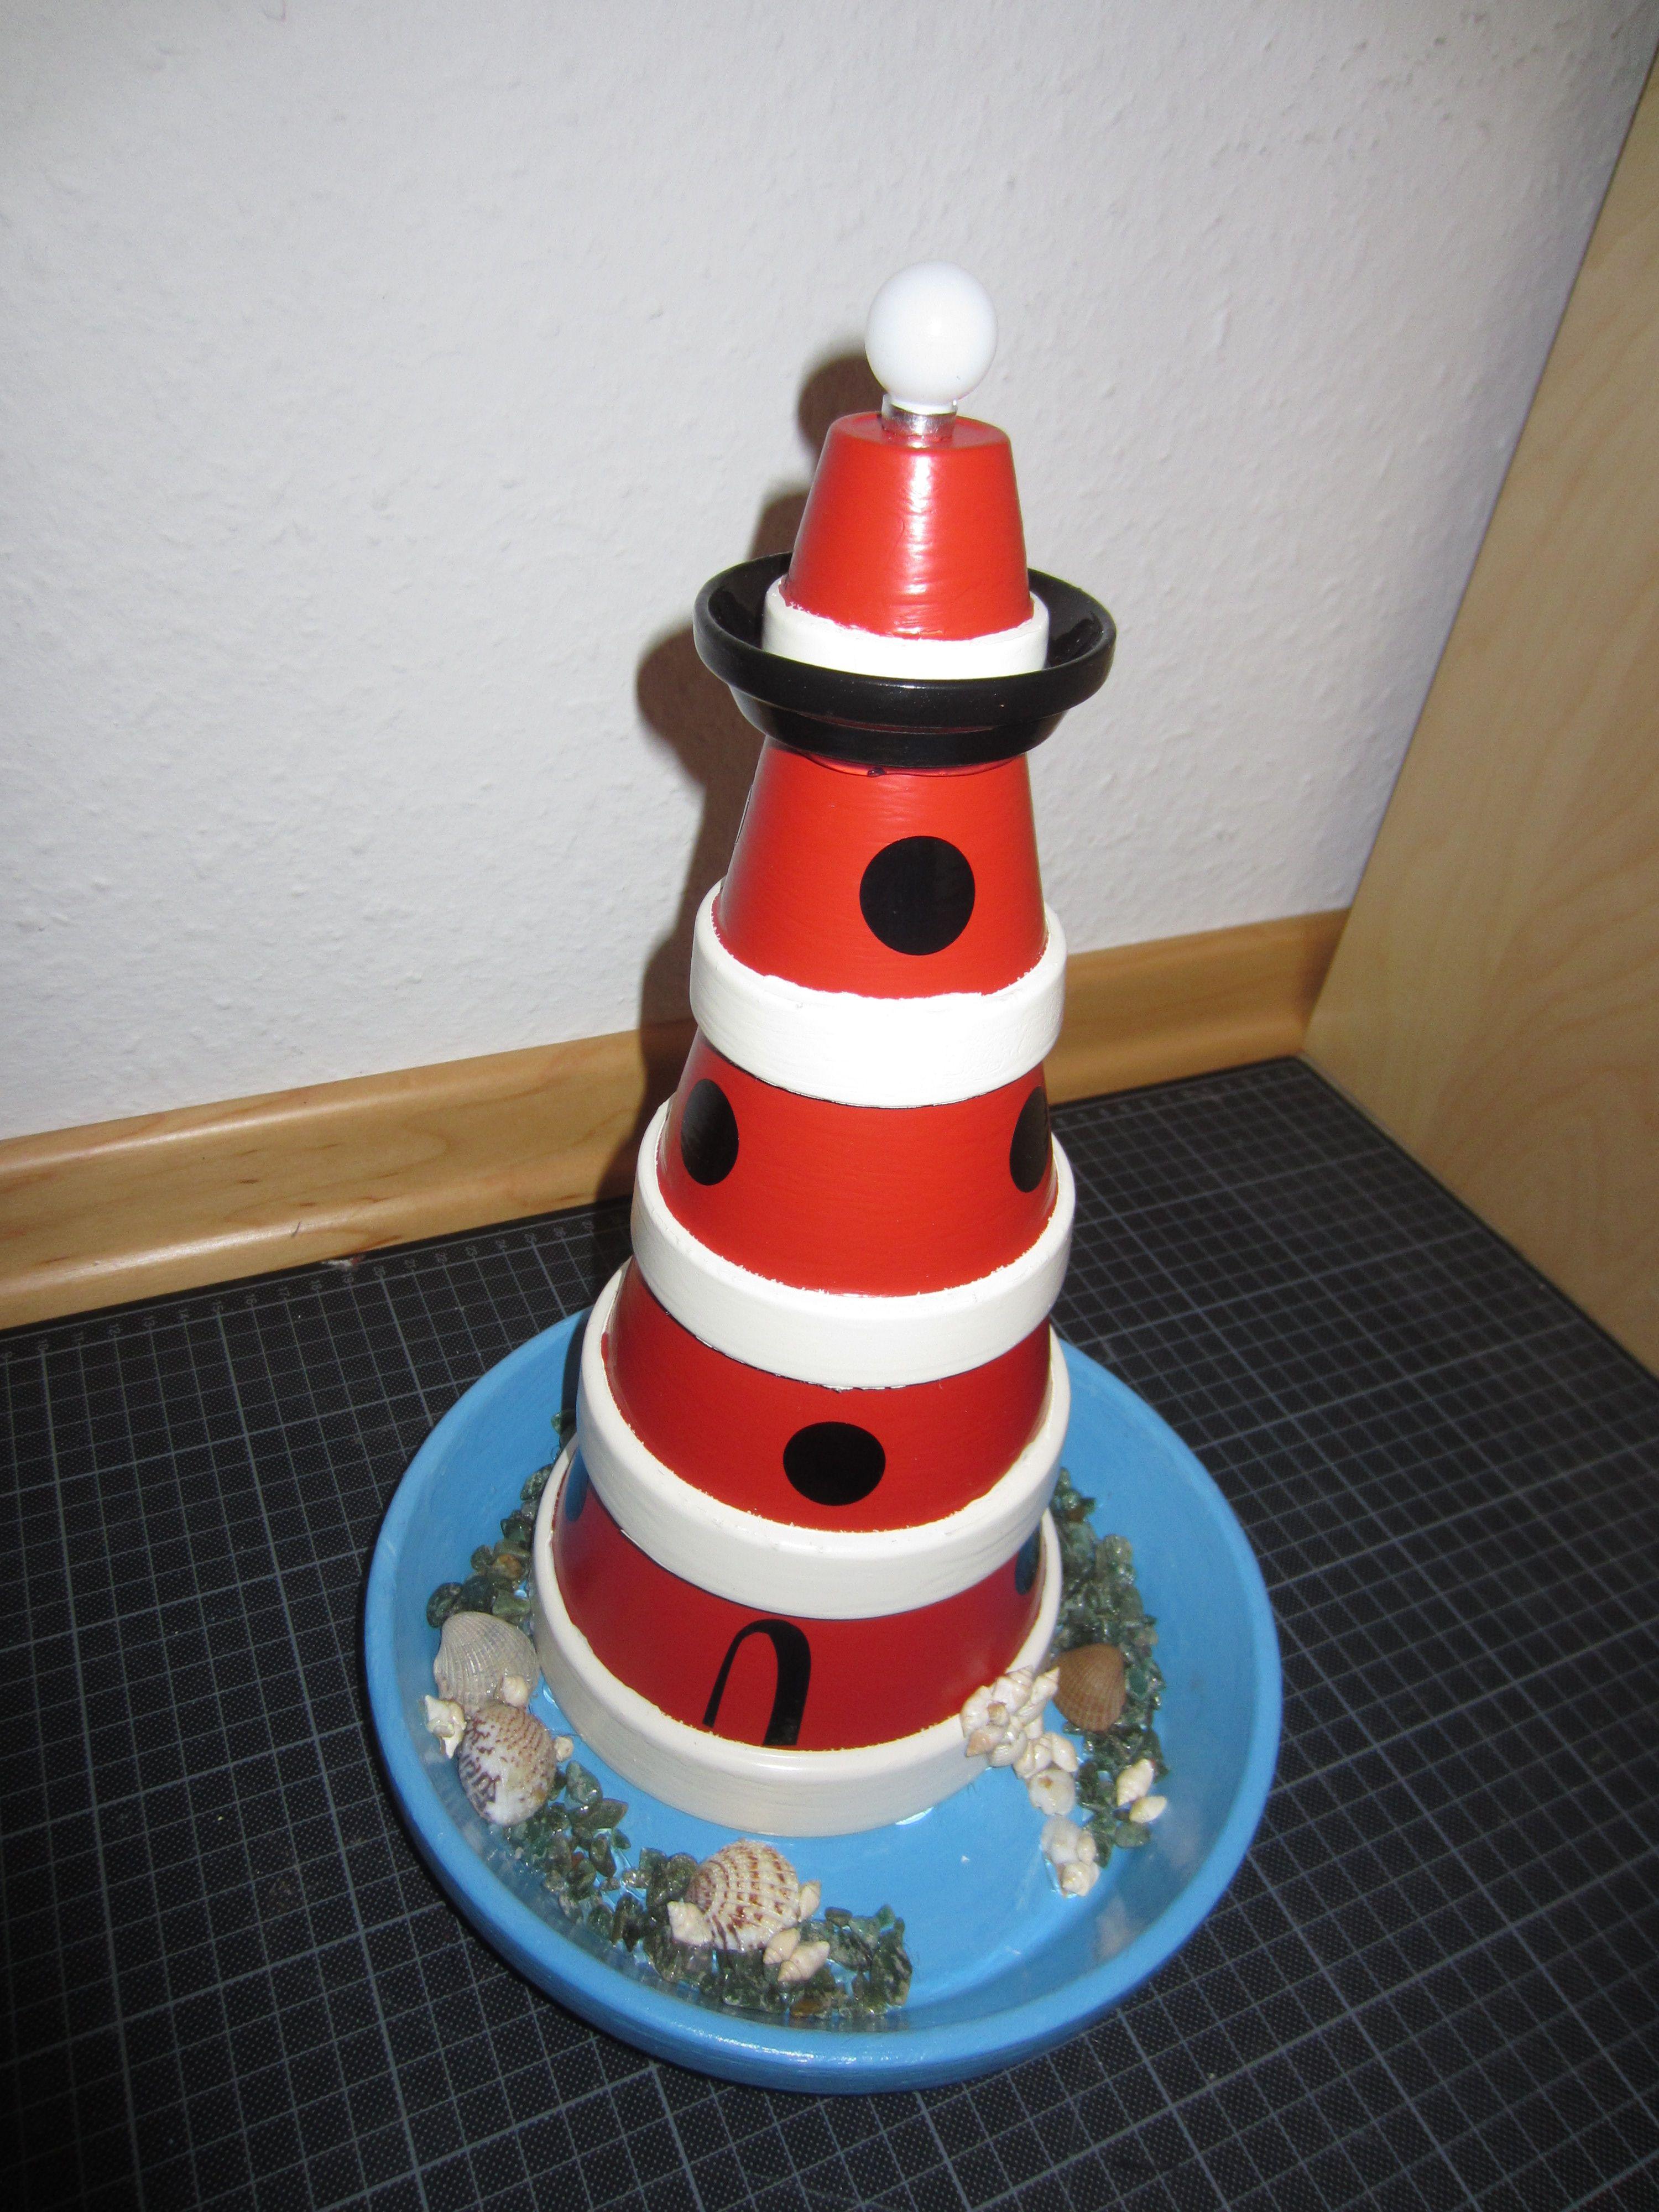 Dekoration aus tont pfen leuchtturm aus tont pfen for Leuchtturm basteln